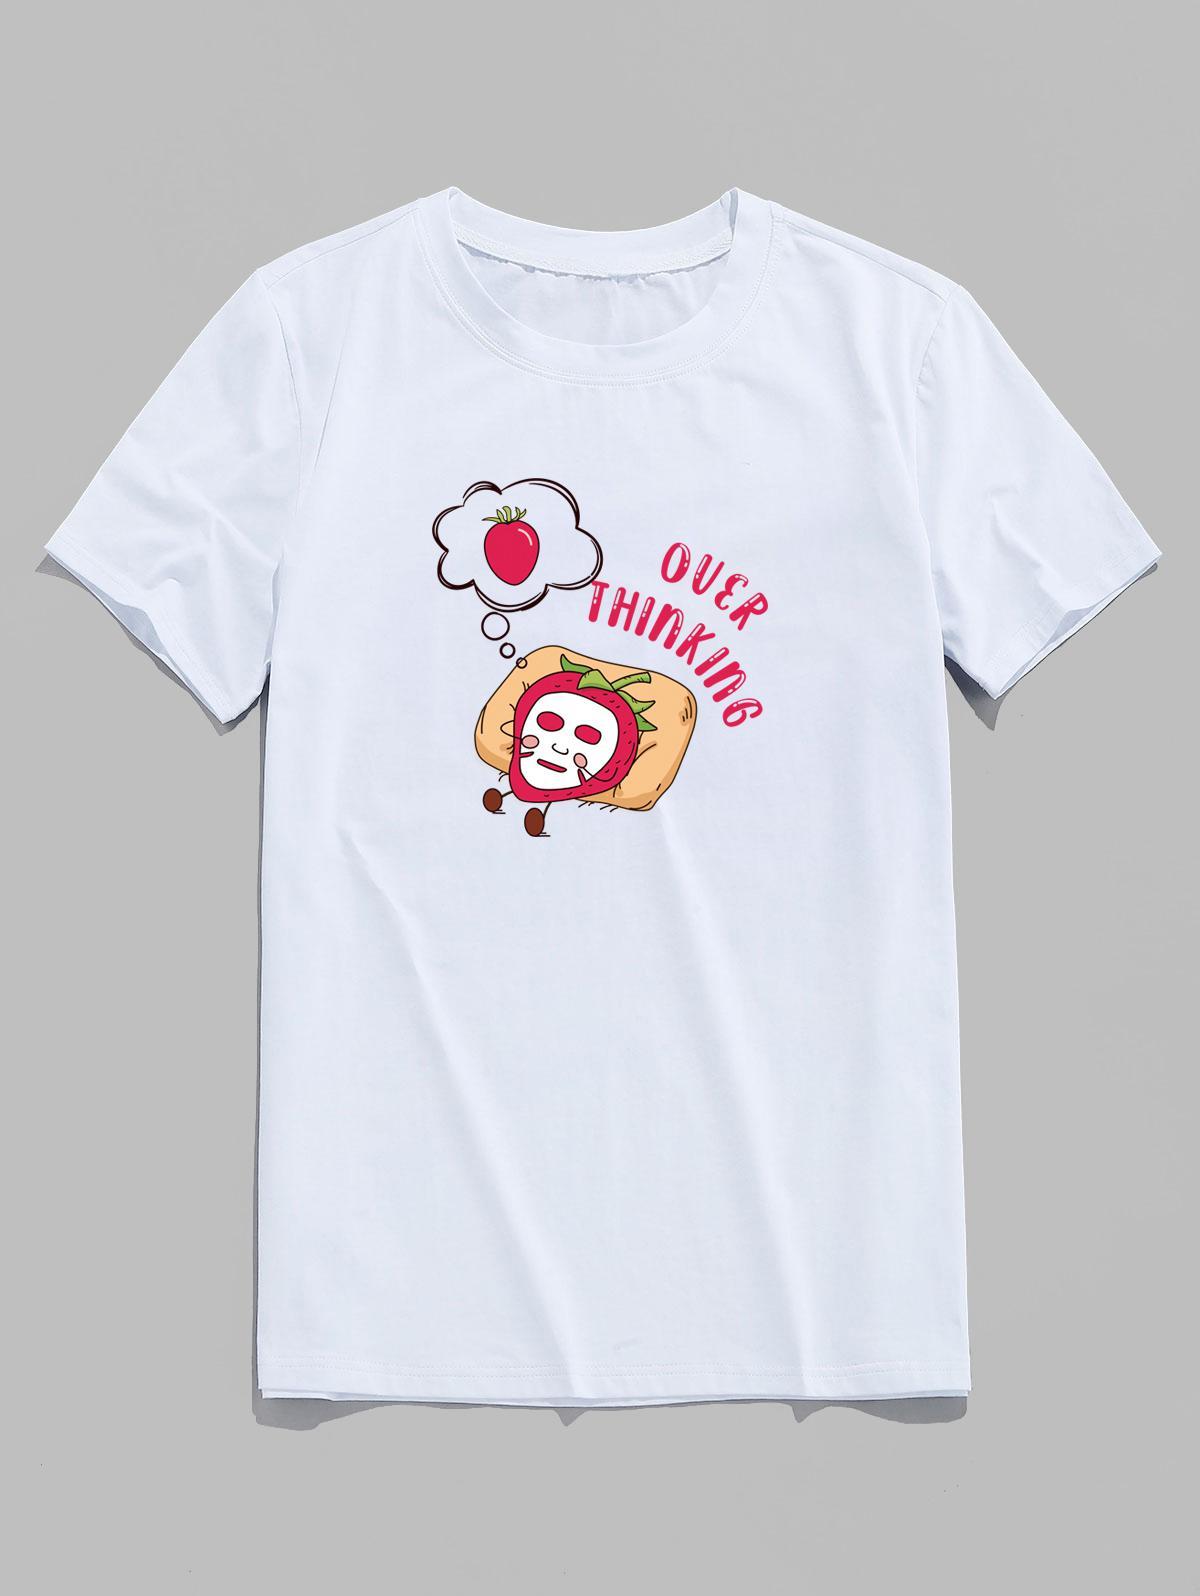 Over Thinking Cartoon Strawberry Print Basic T-shirt